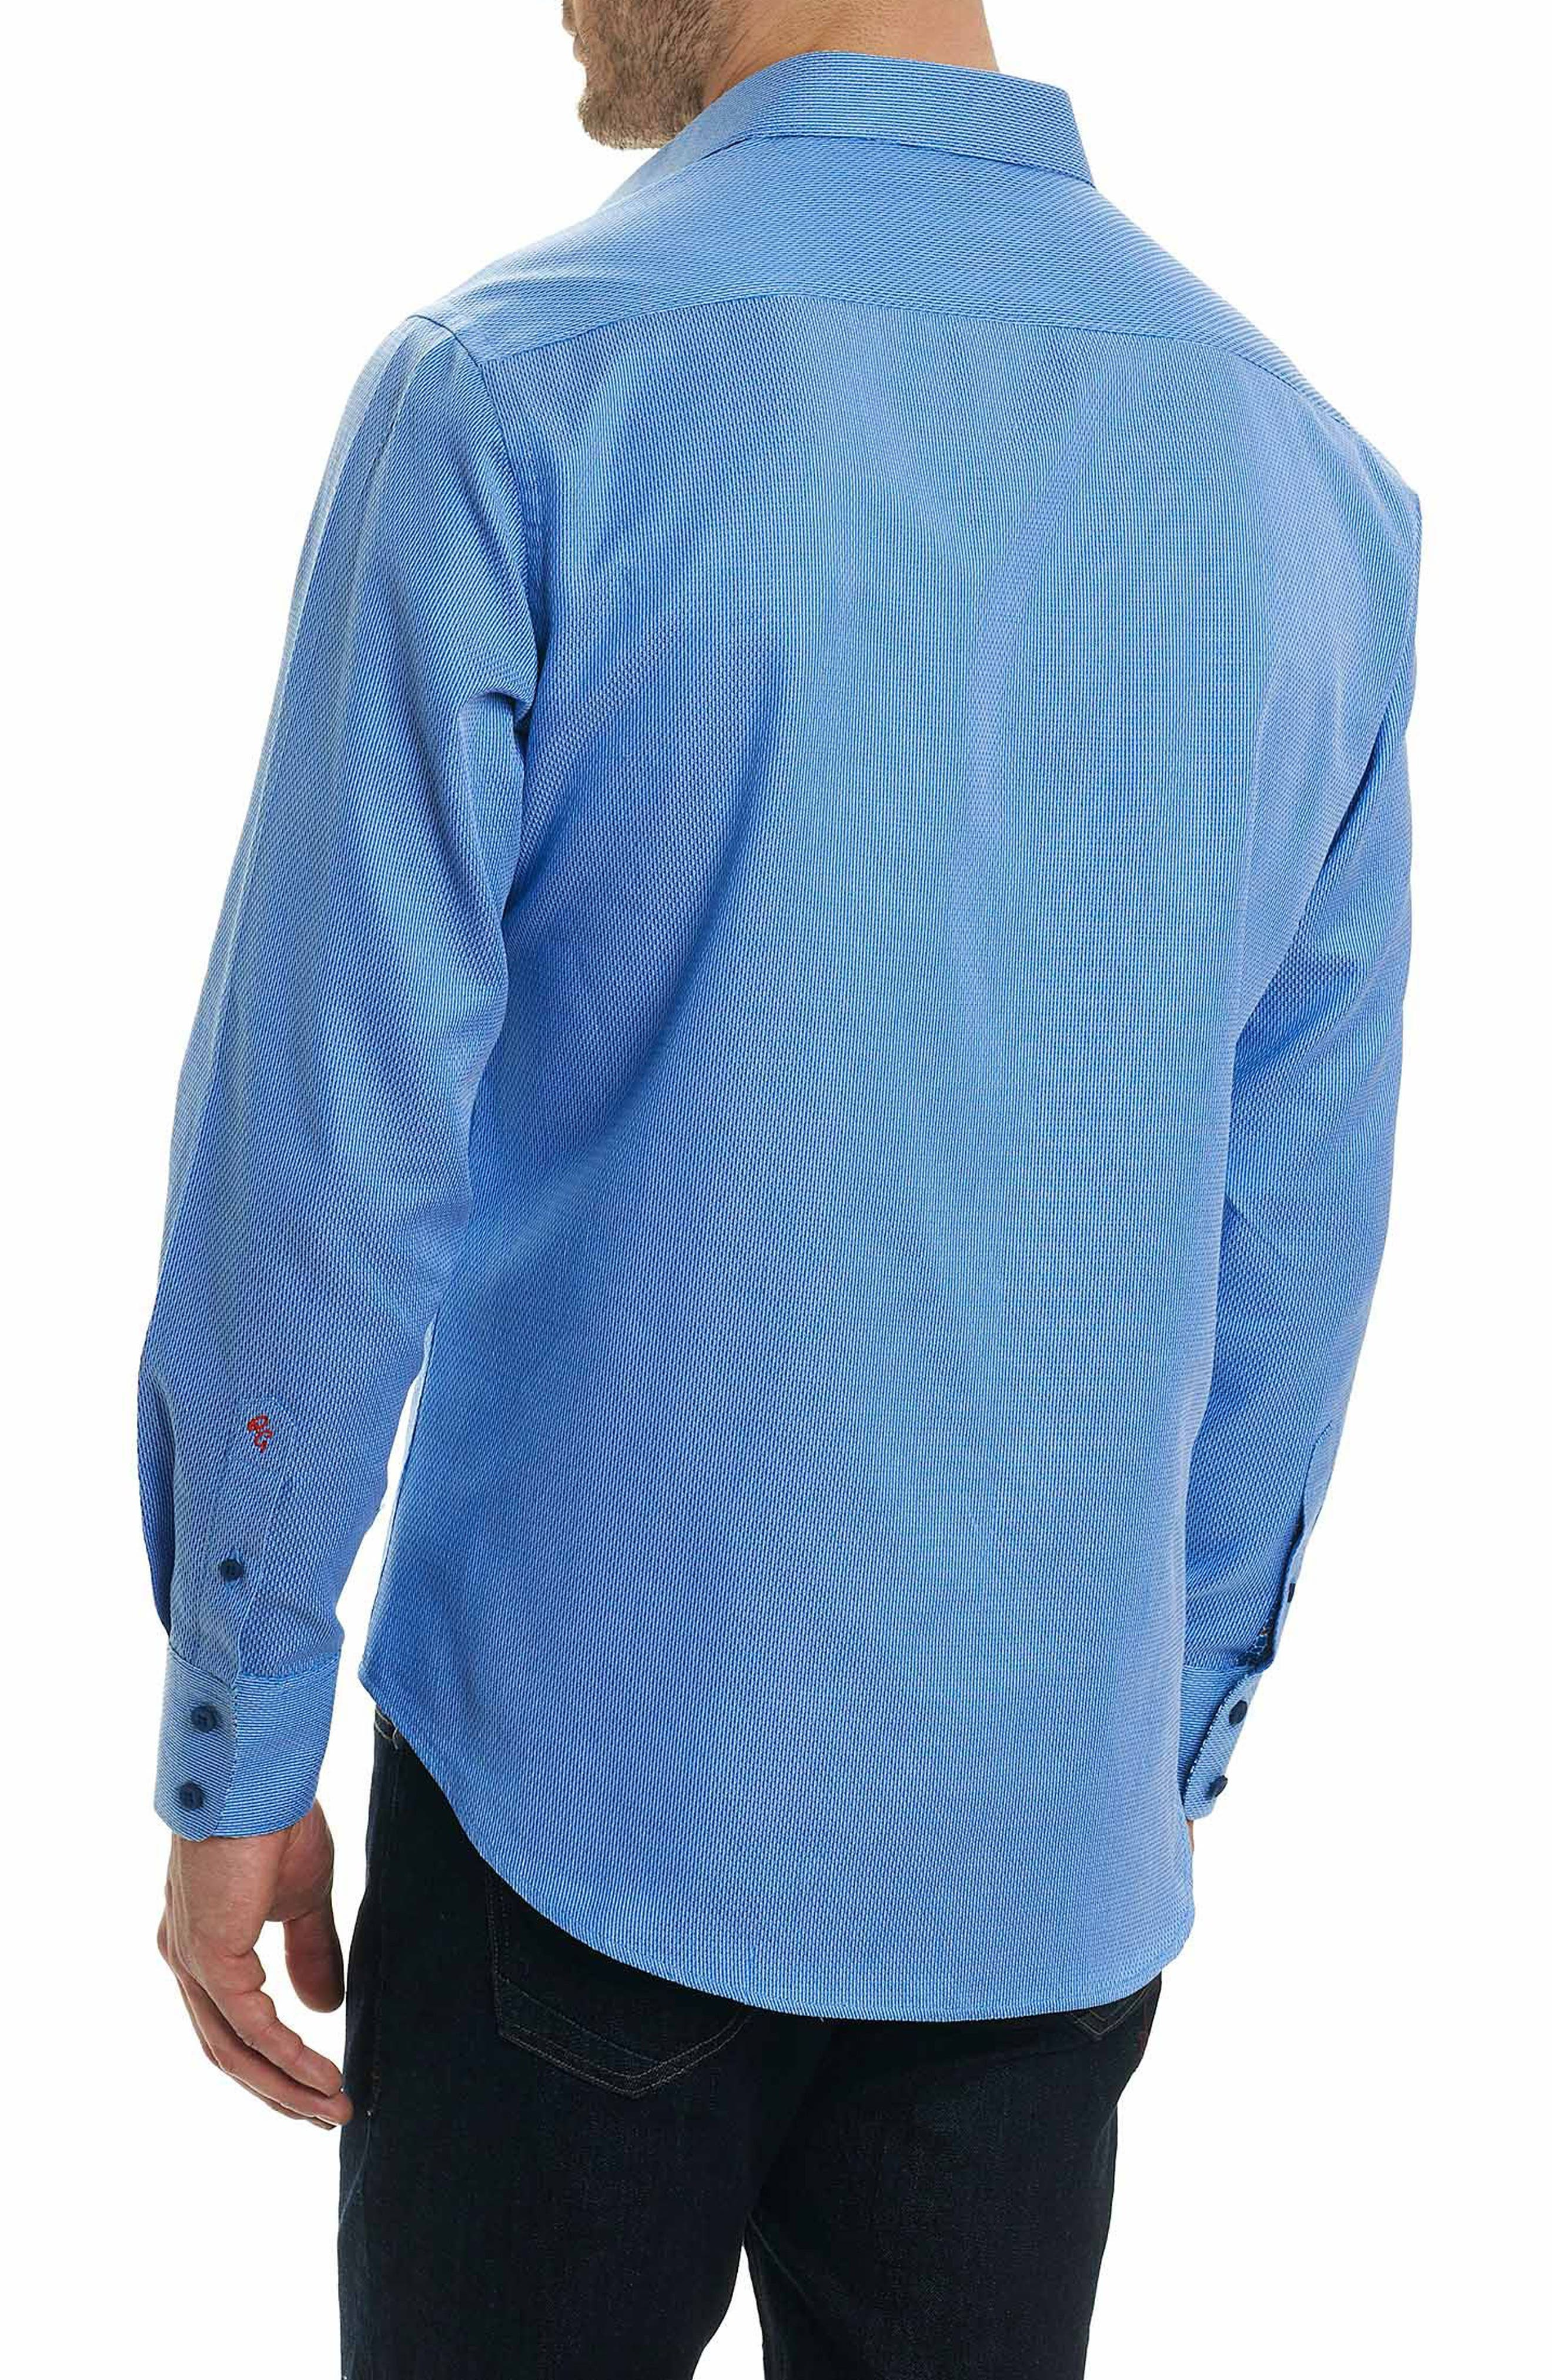 Jobson Regular Fit Sport Shirt,                             Alternate thumbnail 2, color,                             400